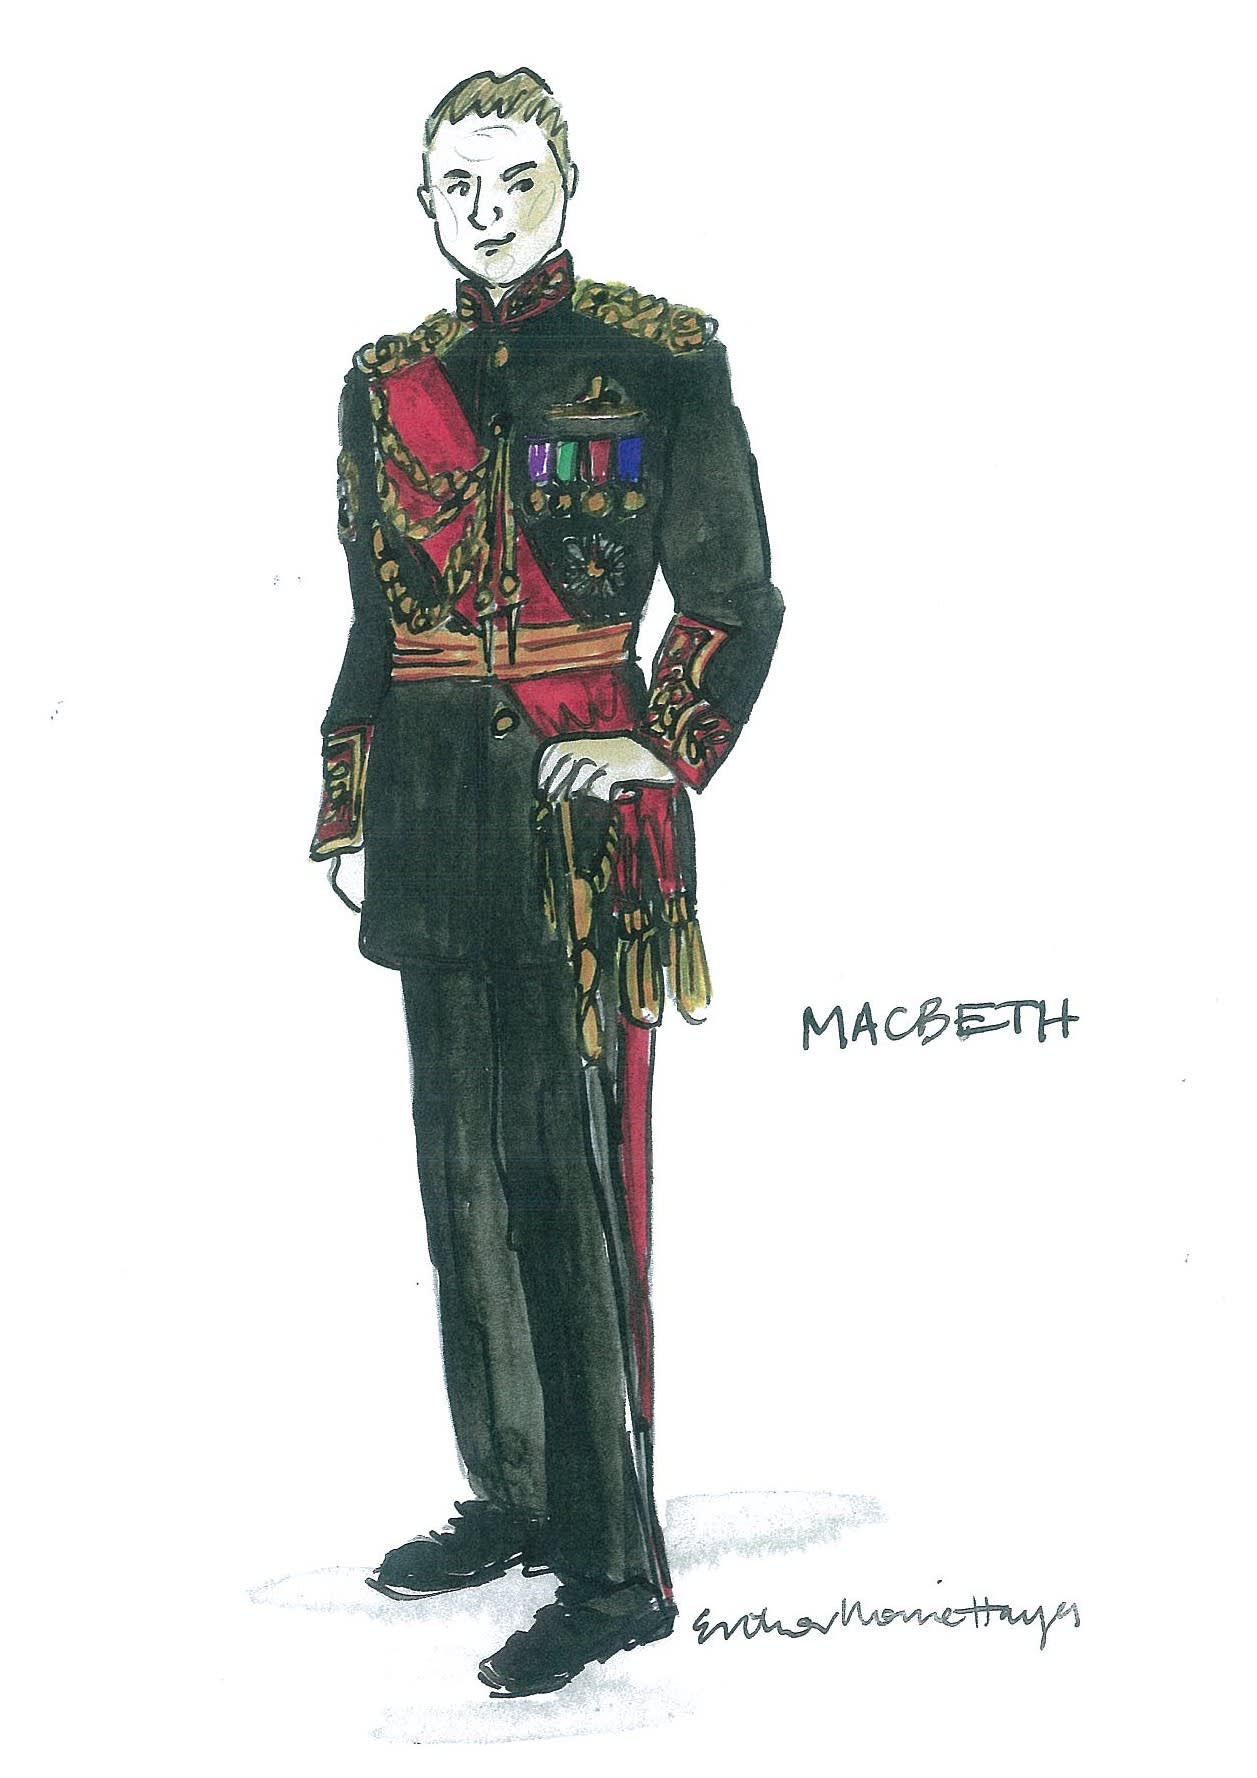 Macbeth_costume.jpg